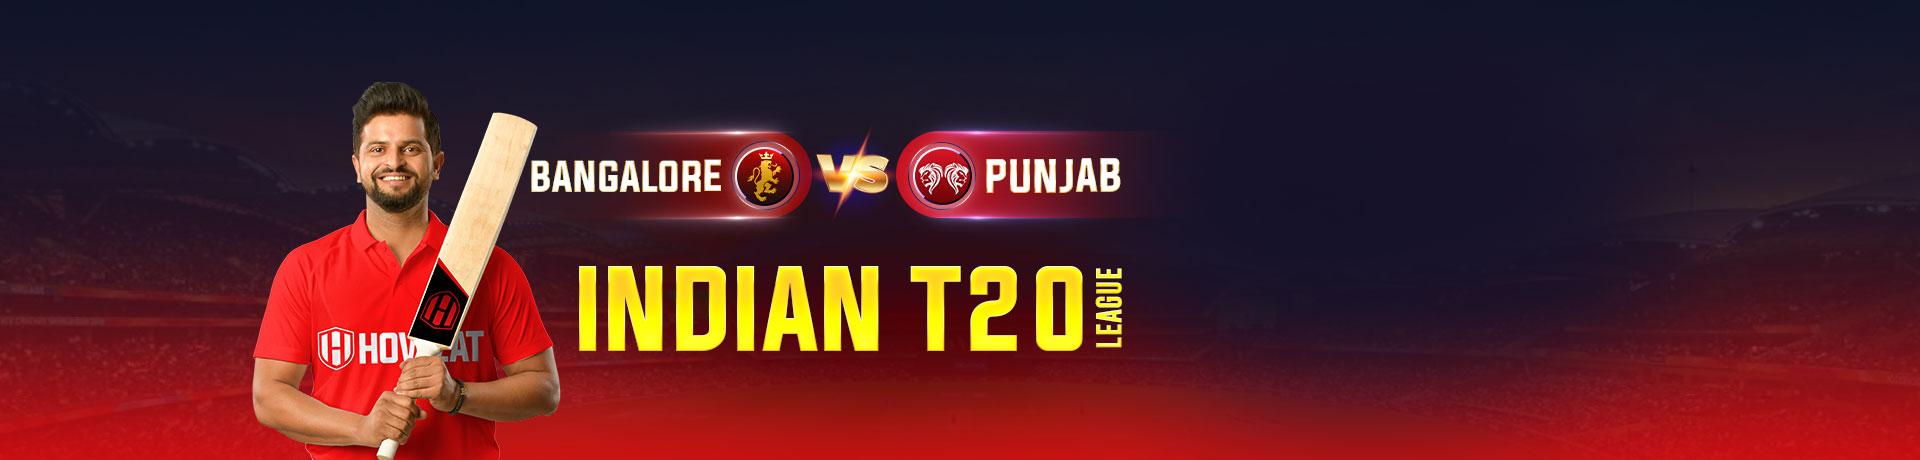 Bangalore vs Punjab Indian T20 League